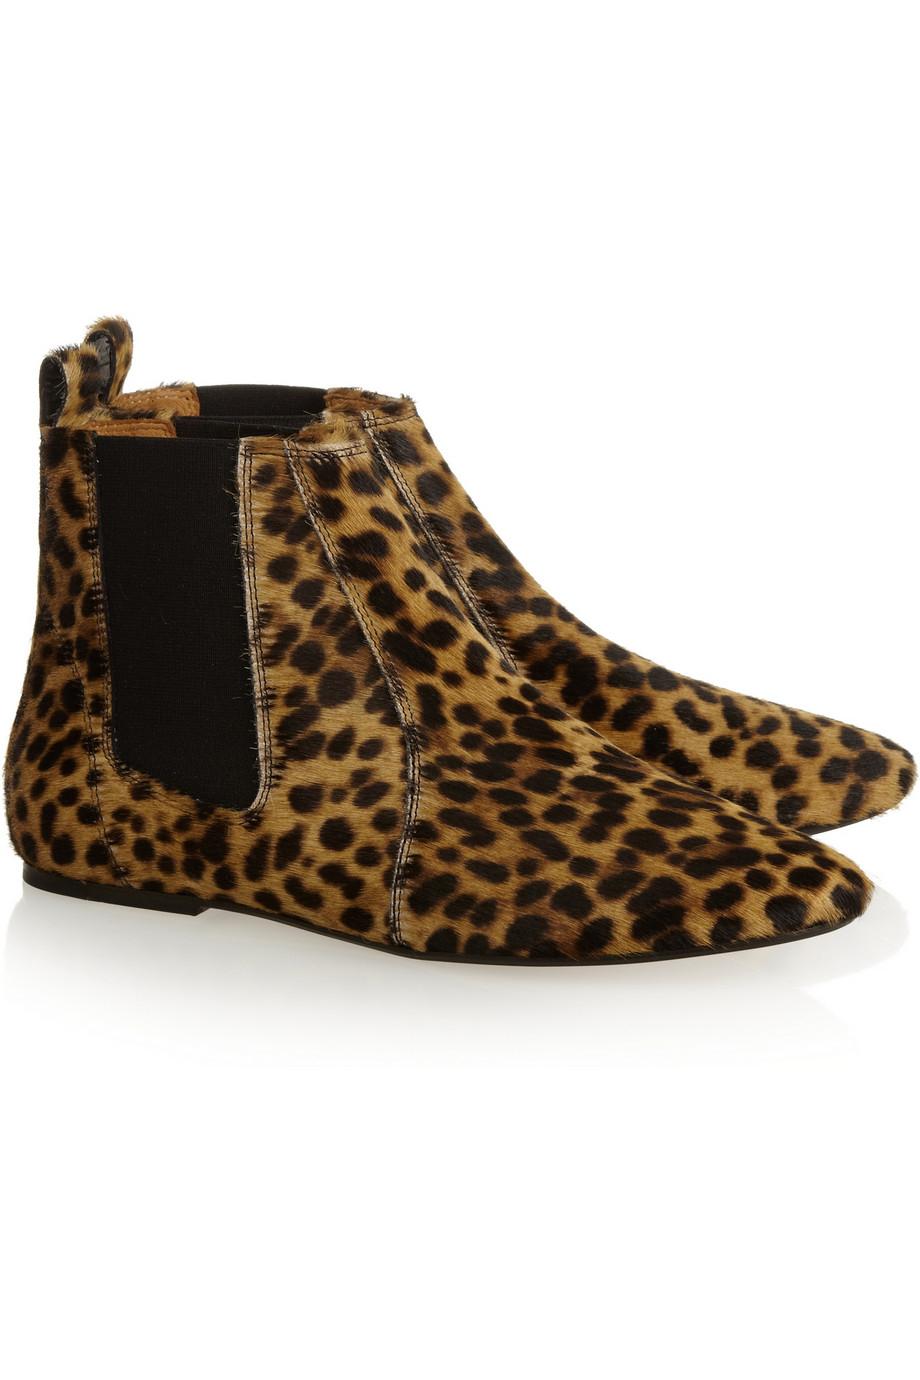 Lyst Isabel Marant 201 Toile Dewar Leopardprint Calf Hair